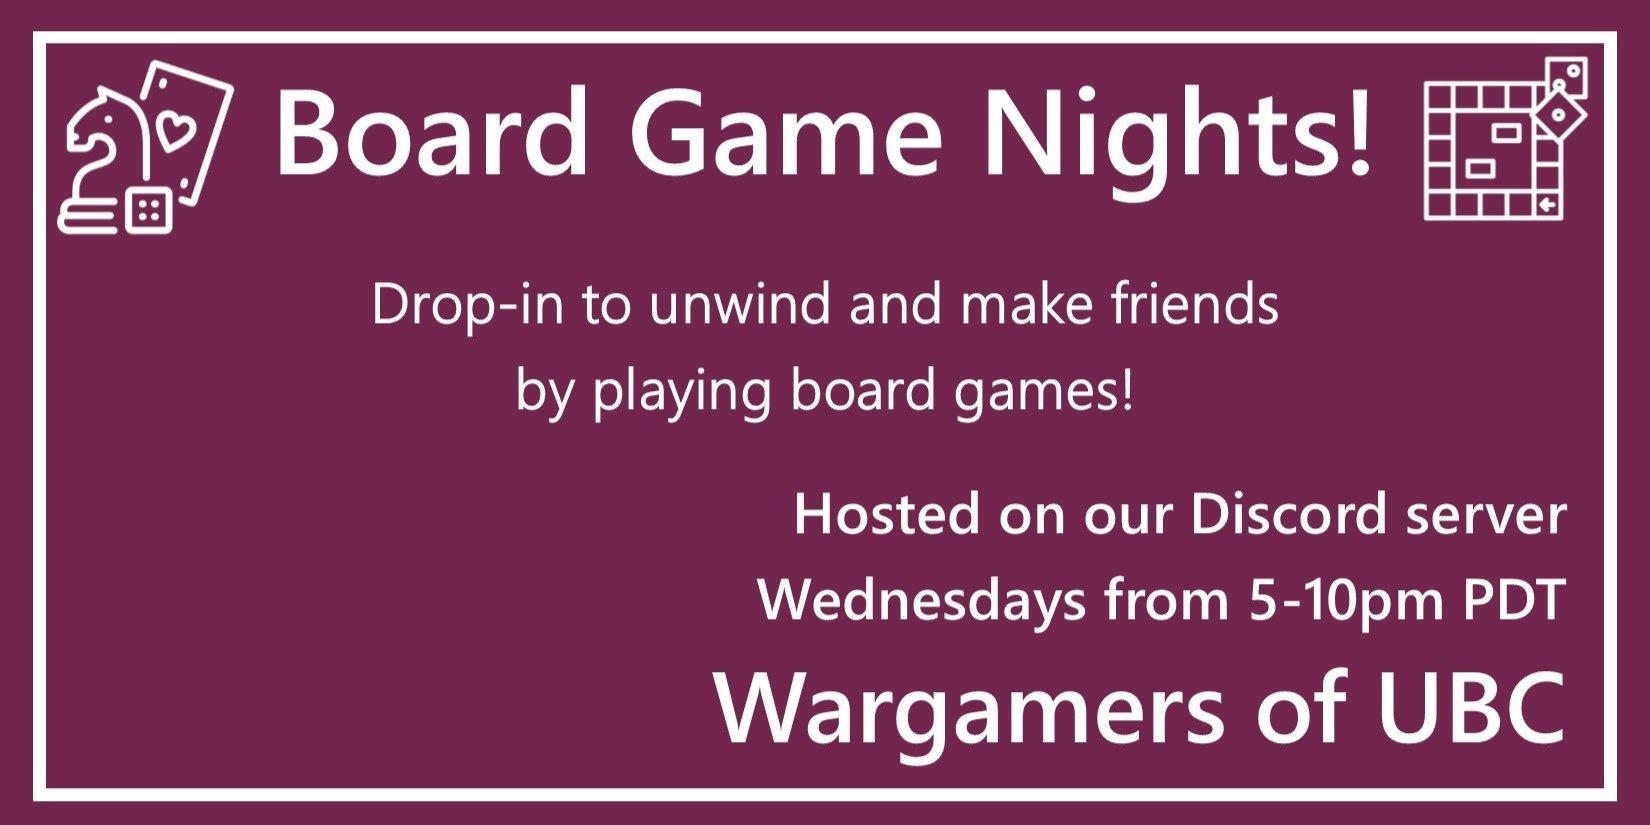 Wednesday Board Game Nights